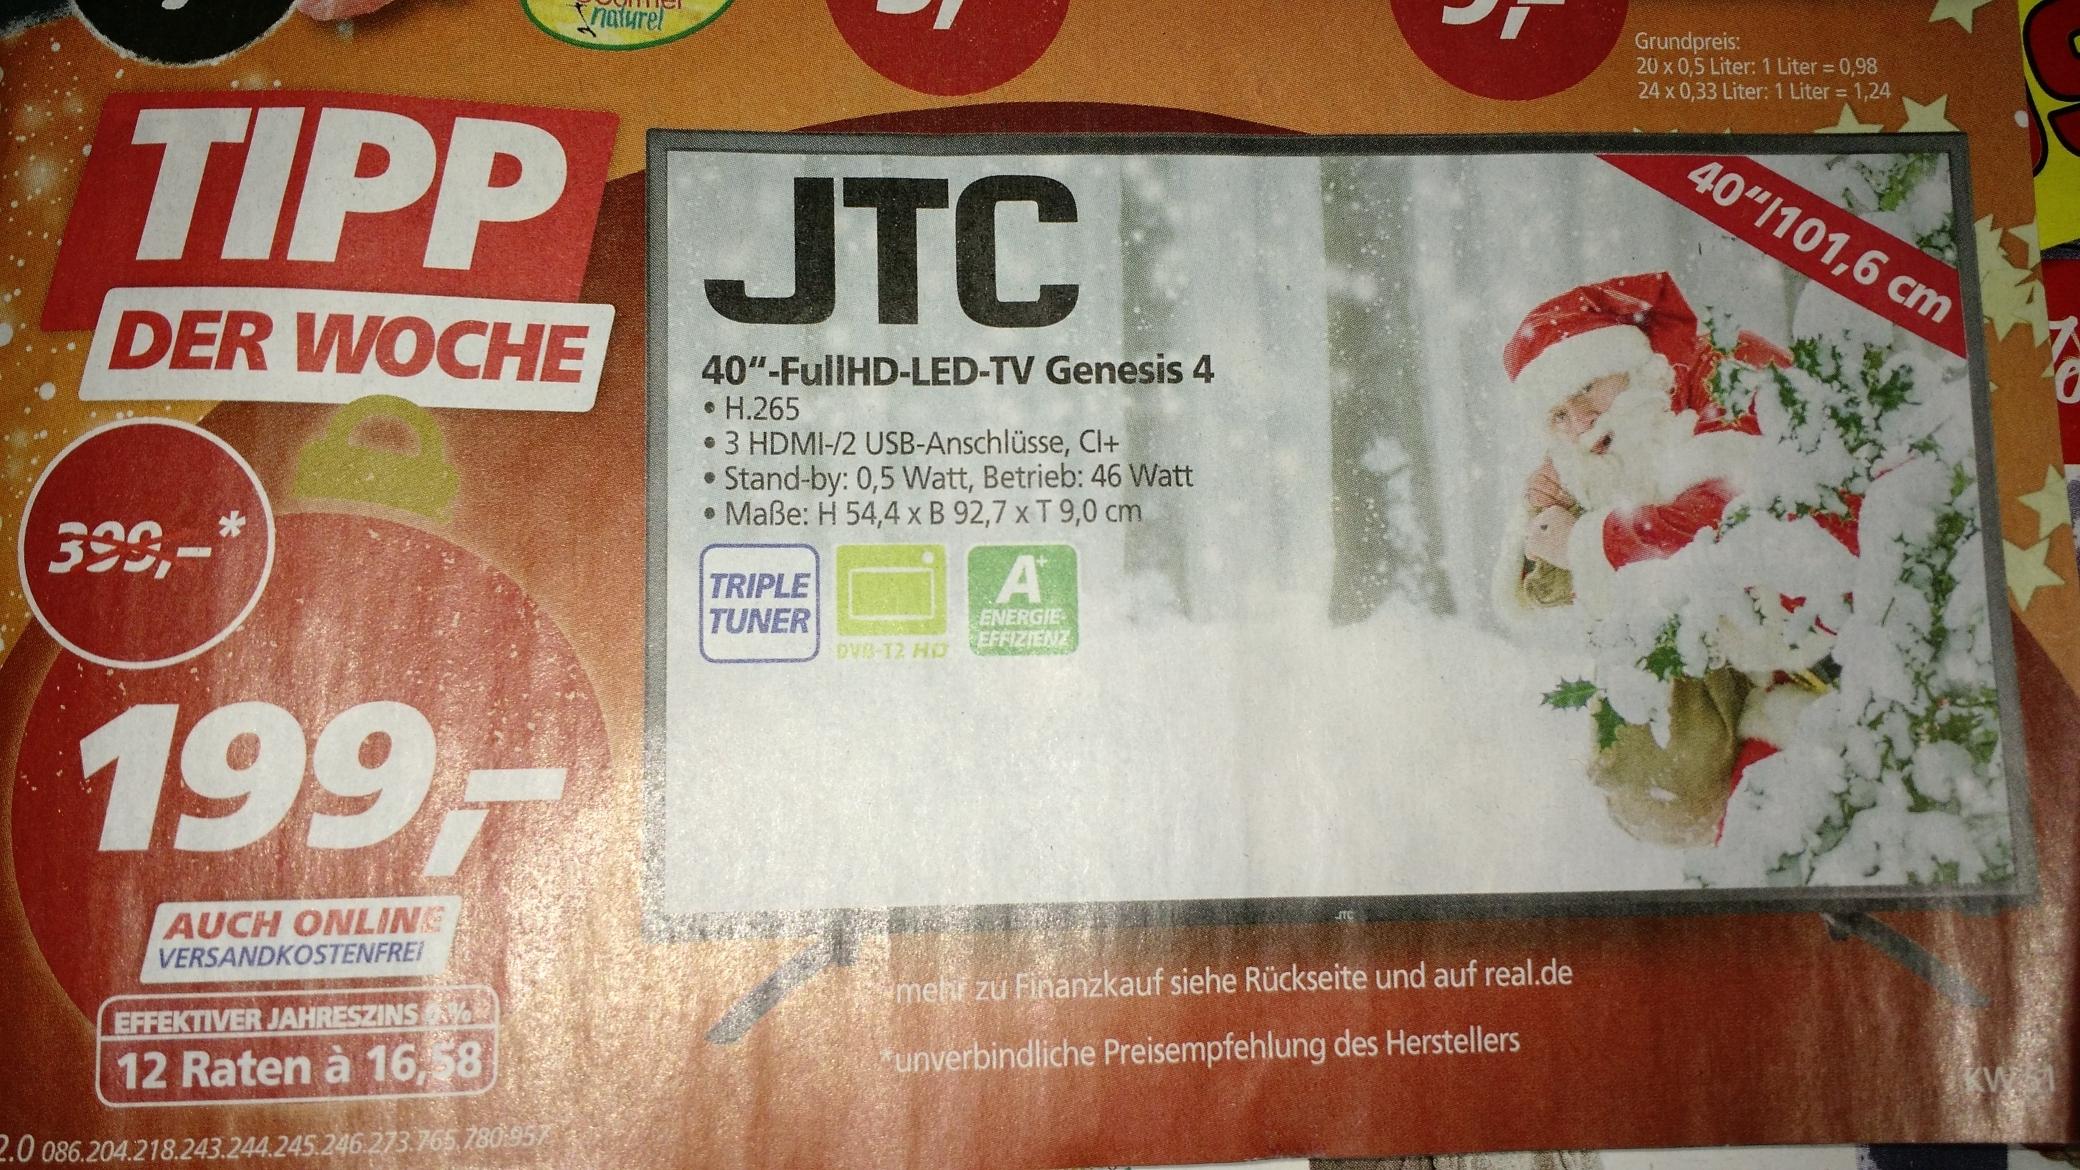 "[,-real bundesweit] JTC Genesis 4 TV 40"" (FHD Edge-lit, 250 cd/m², 4.000:1, Triple Tuner, CI+, 3x HDMI, 2x USB, EEK A+) für eff. 184€"